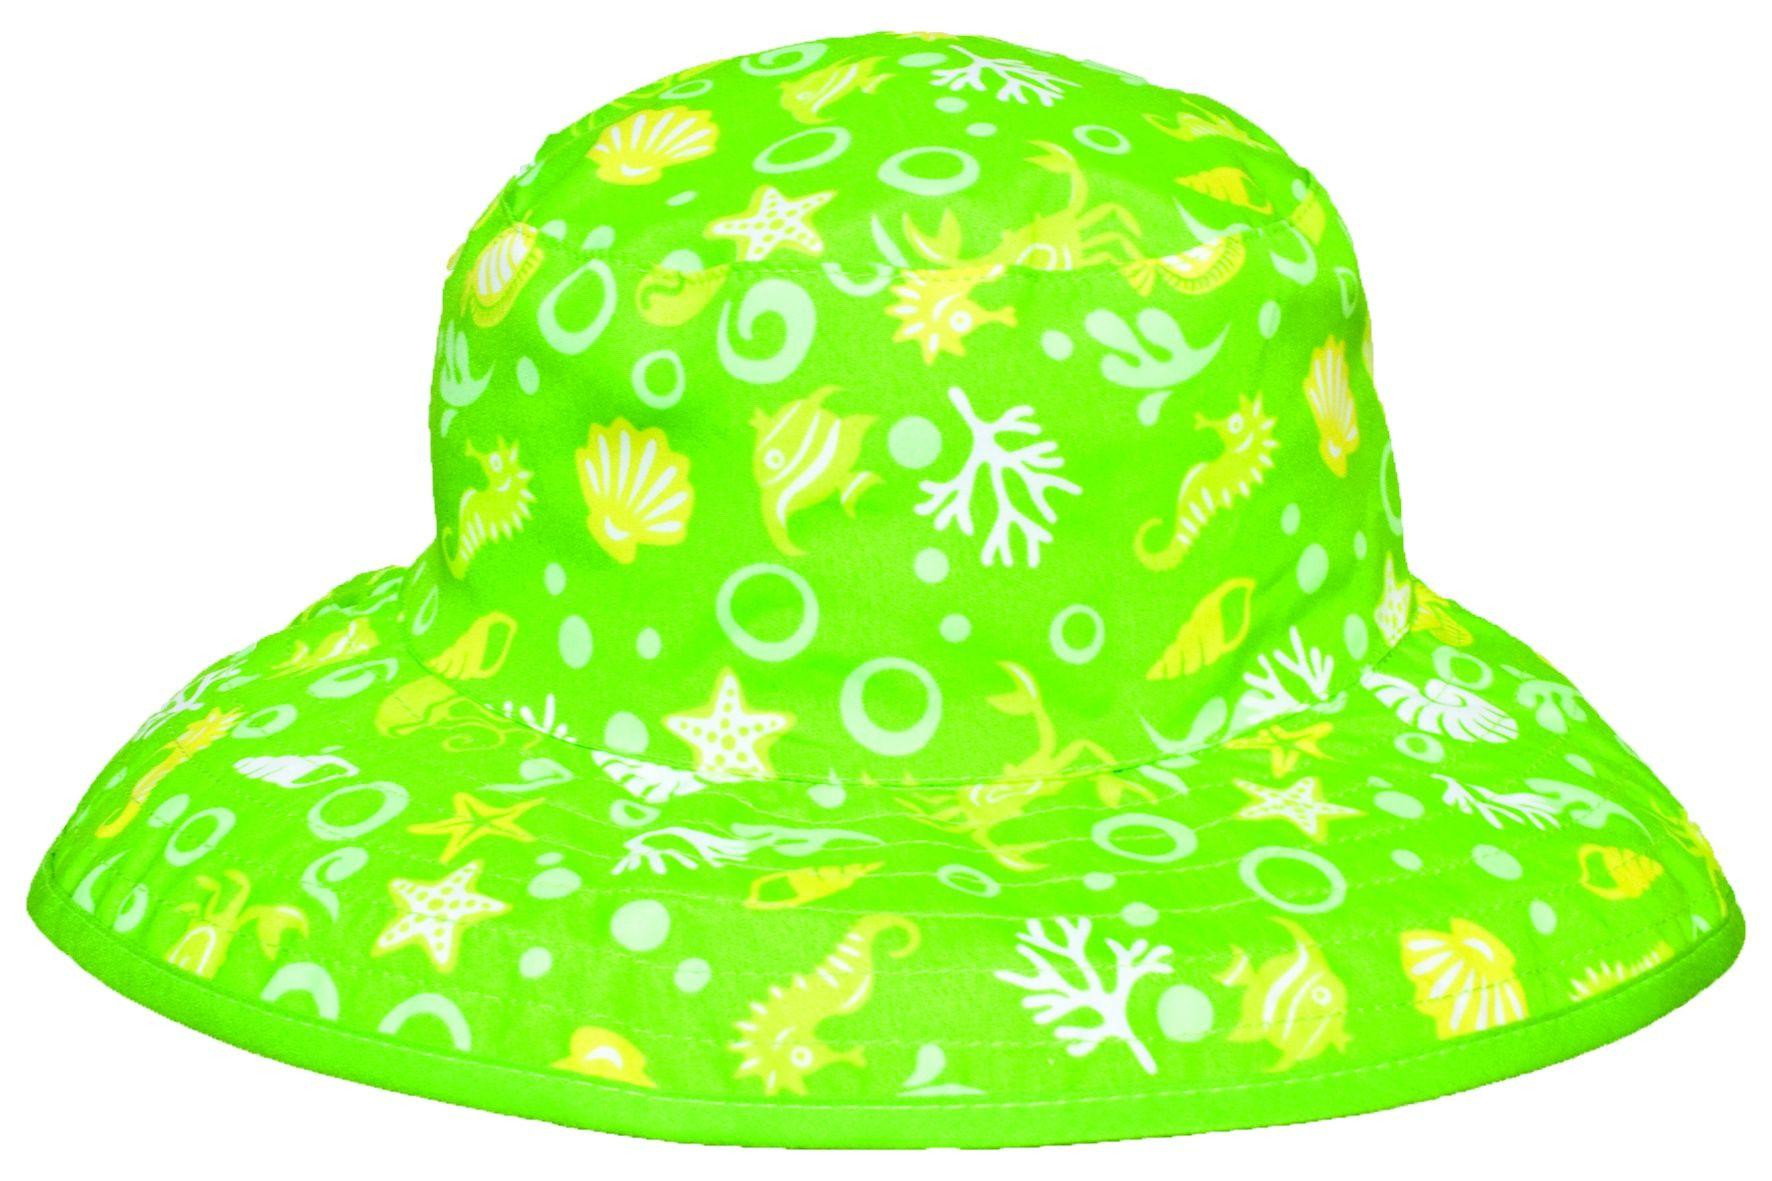 Cap clipart sun hat. Free download clip art